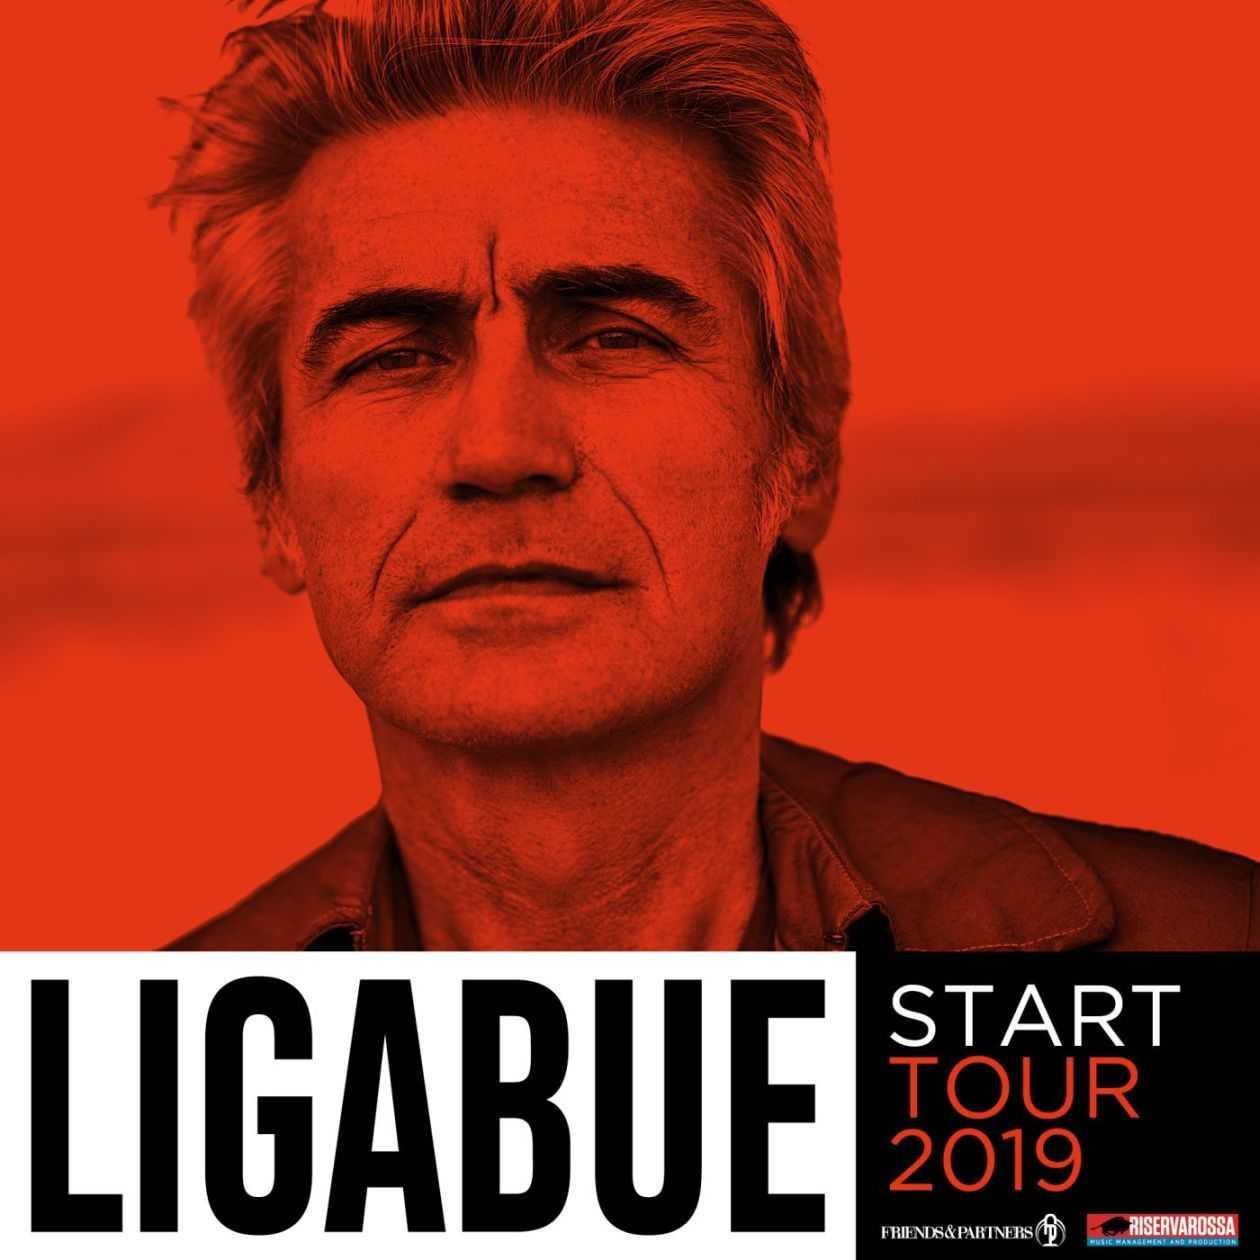 Luciano Ligabue a Milano - Start Tour 2019 | YOUparti stadio san siro